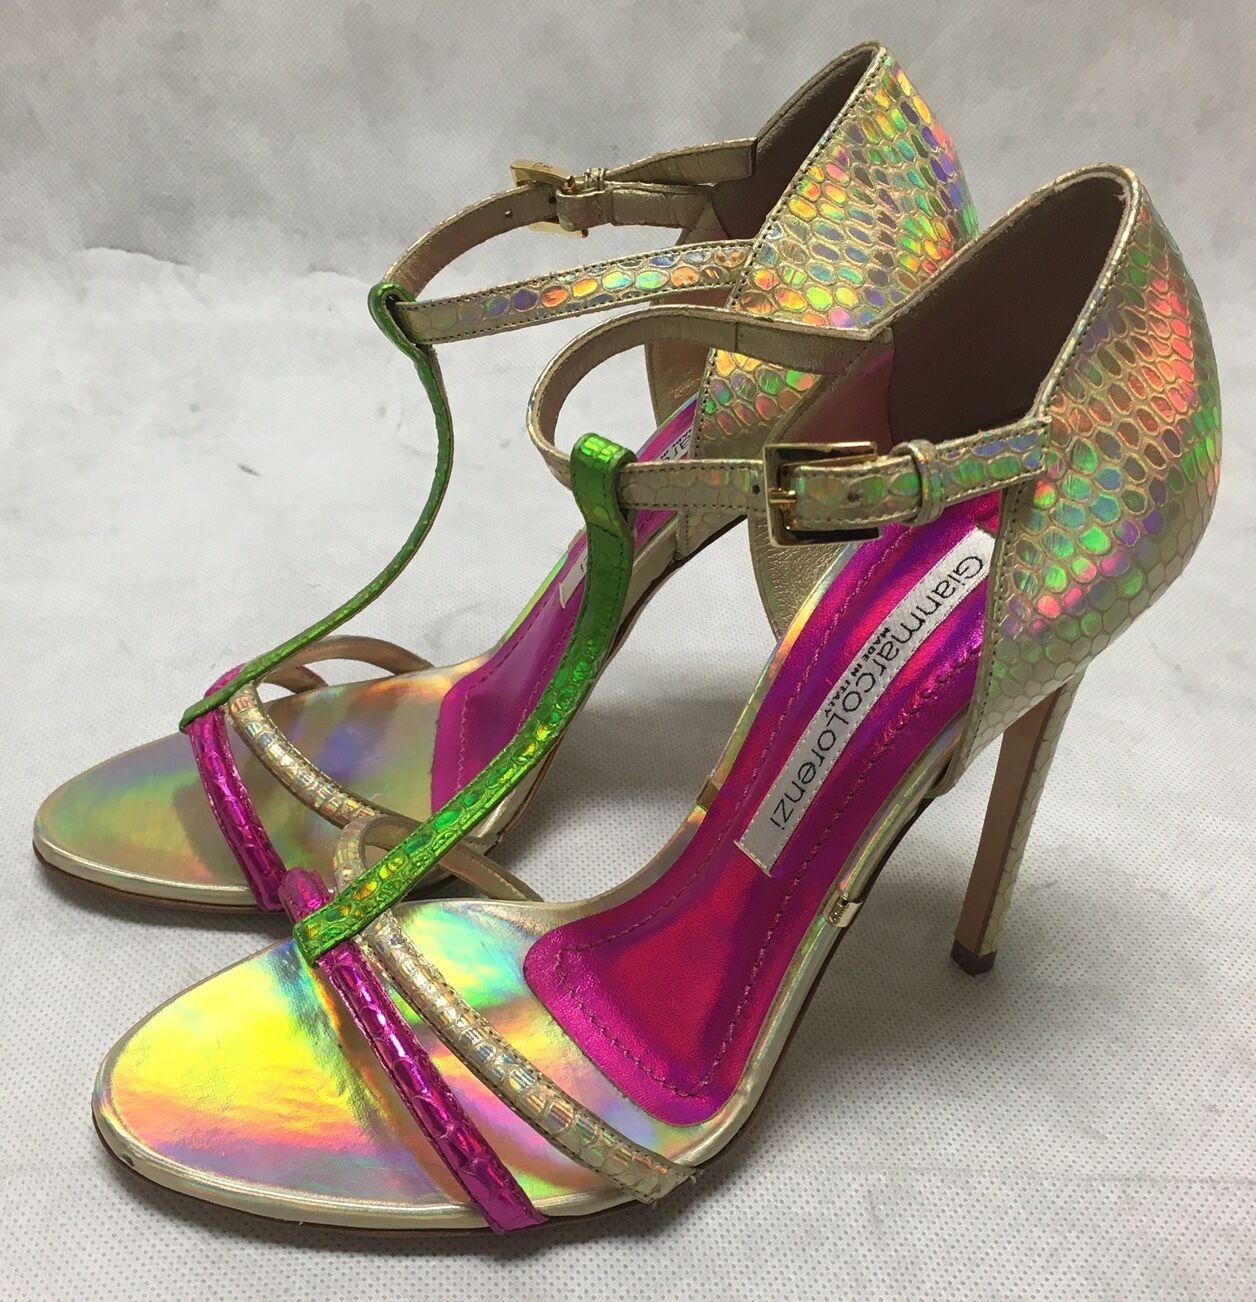 Gianmarco Lorenzi Hologram/pink/green/champagne/gold Sandale Heels. Various Größes